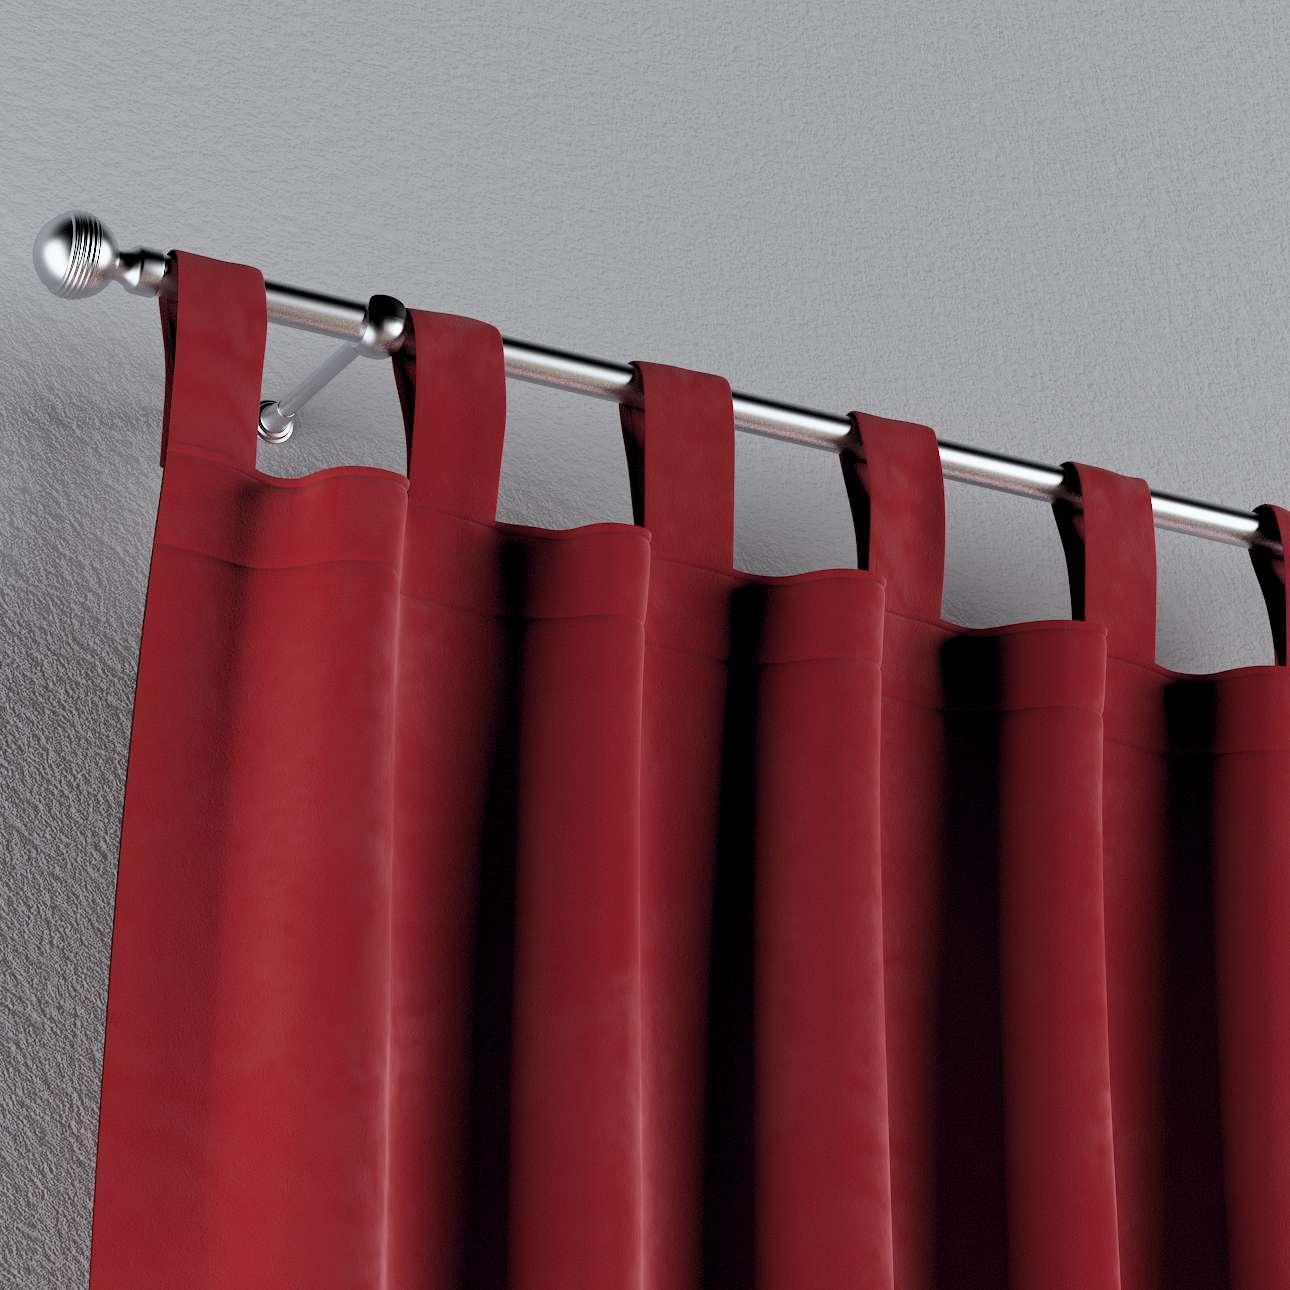 Zasłona na szelkach 1 szt. w kolekcji Velvet, tkanina: 704-15